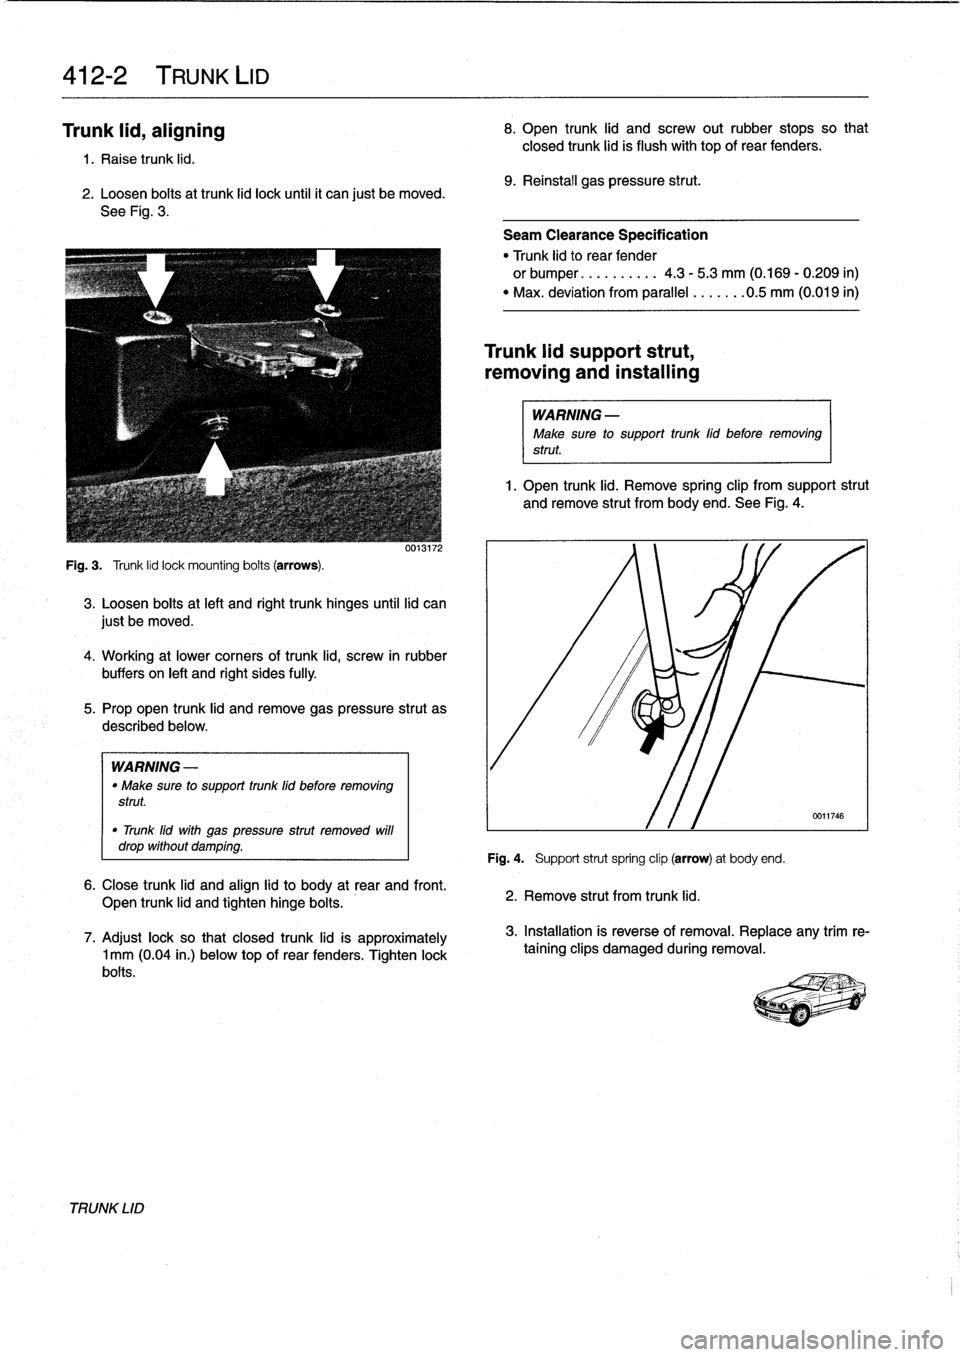 bmw 328i 1997 e36 workshop manual